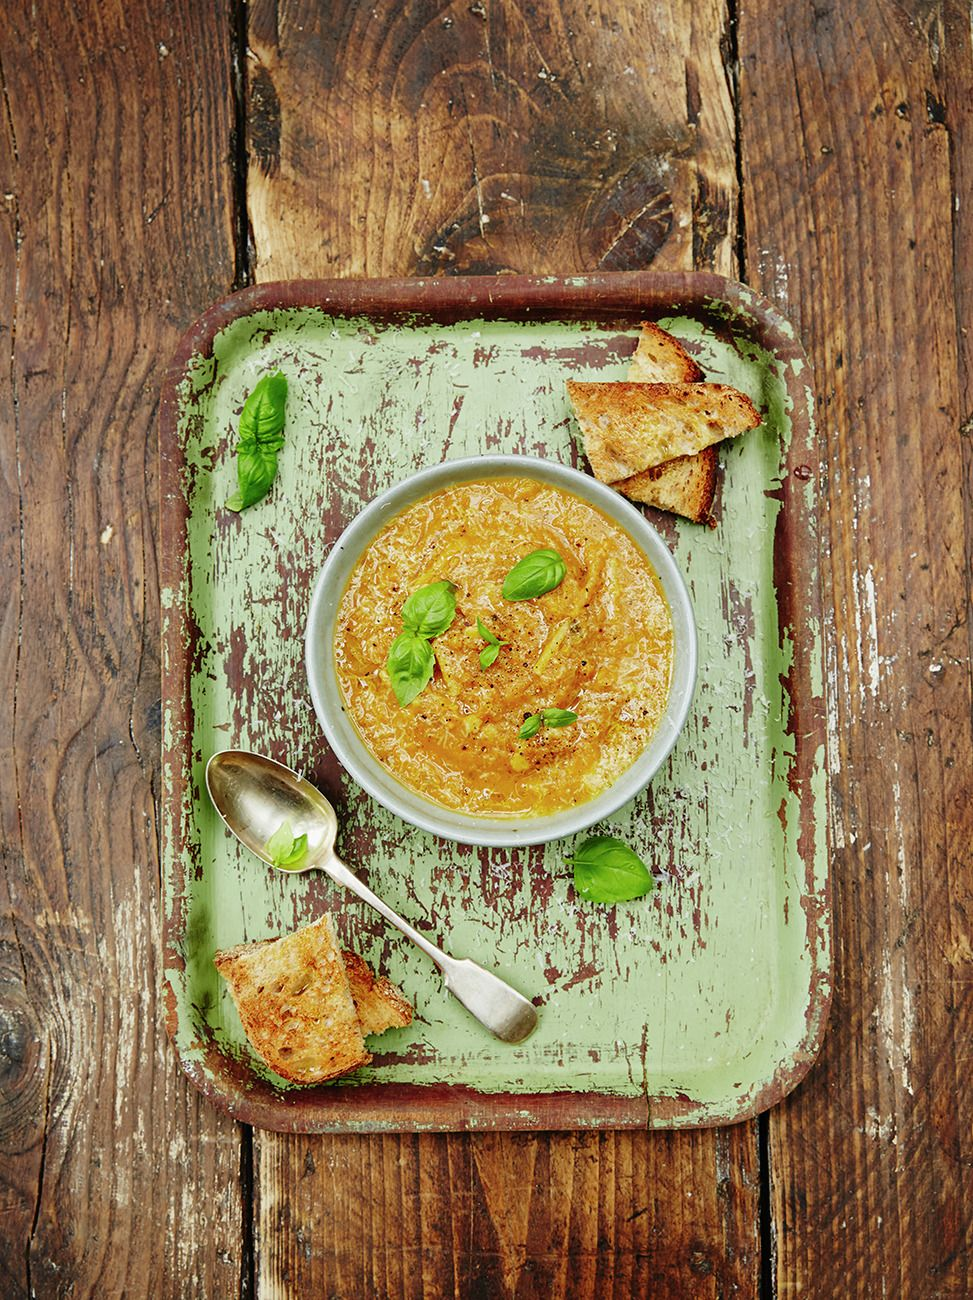 michela s easy minestrone rezept weaning recipes pinterest recipes soup und jamie oliver. Black Bedroom Furniture Sets. Home Design Ideas